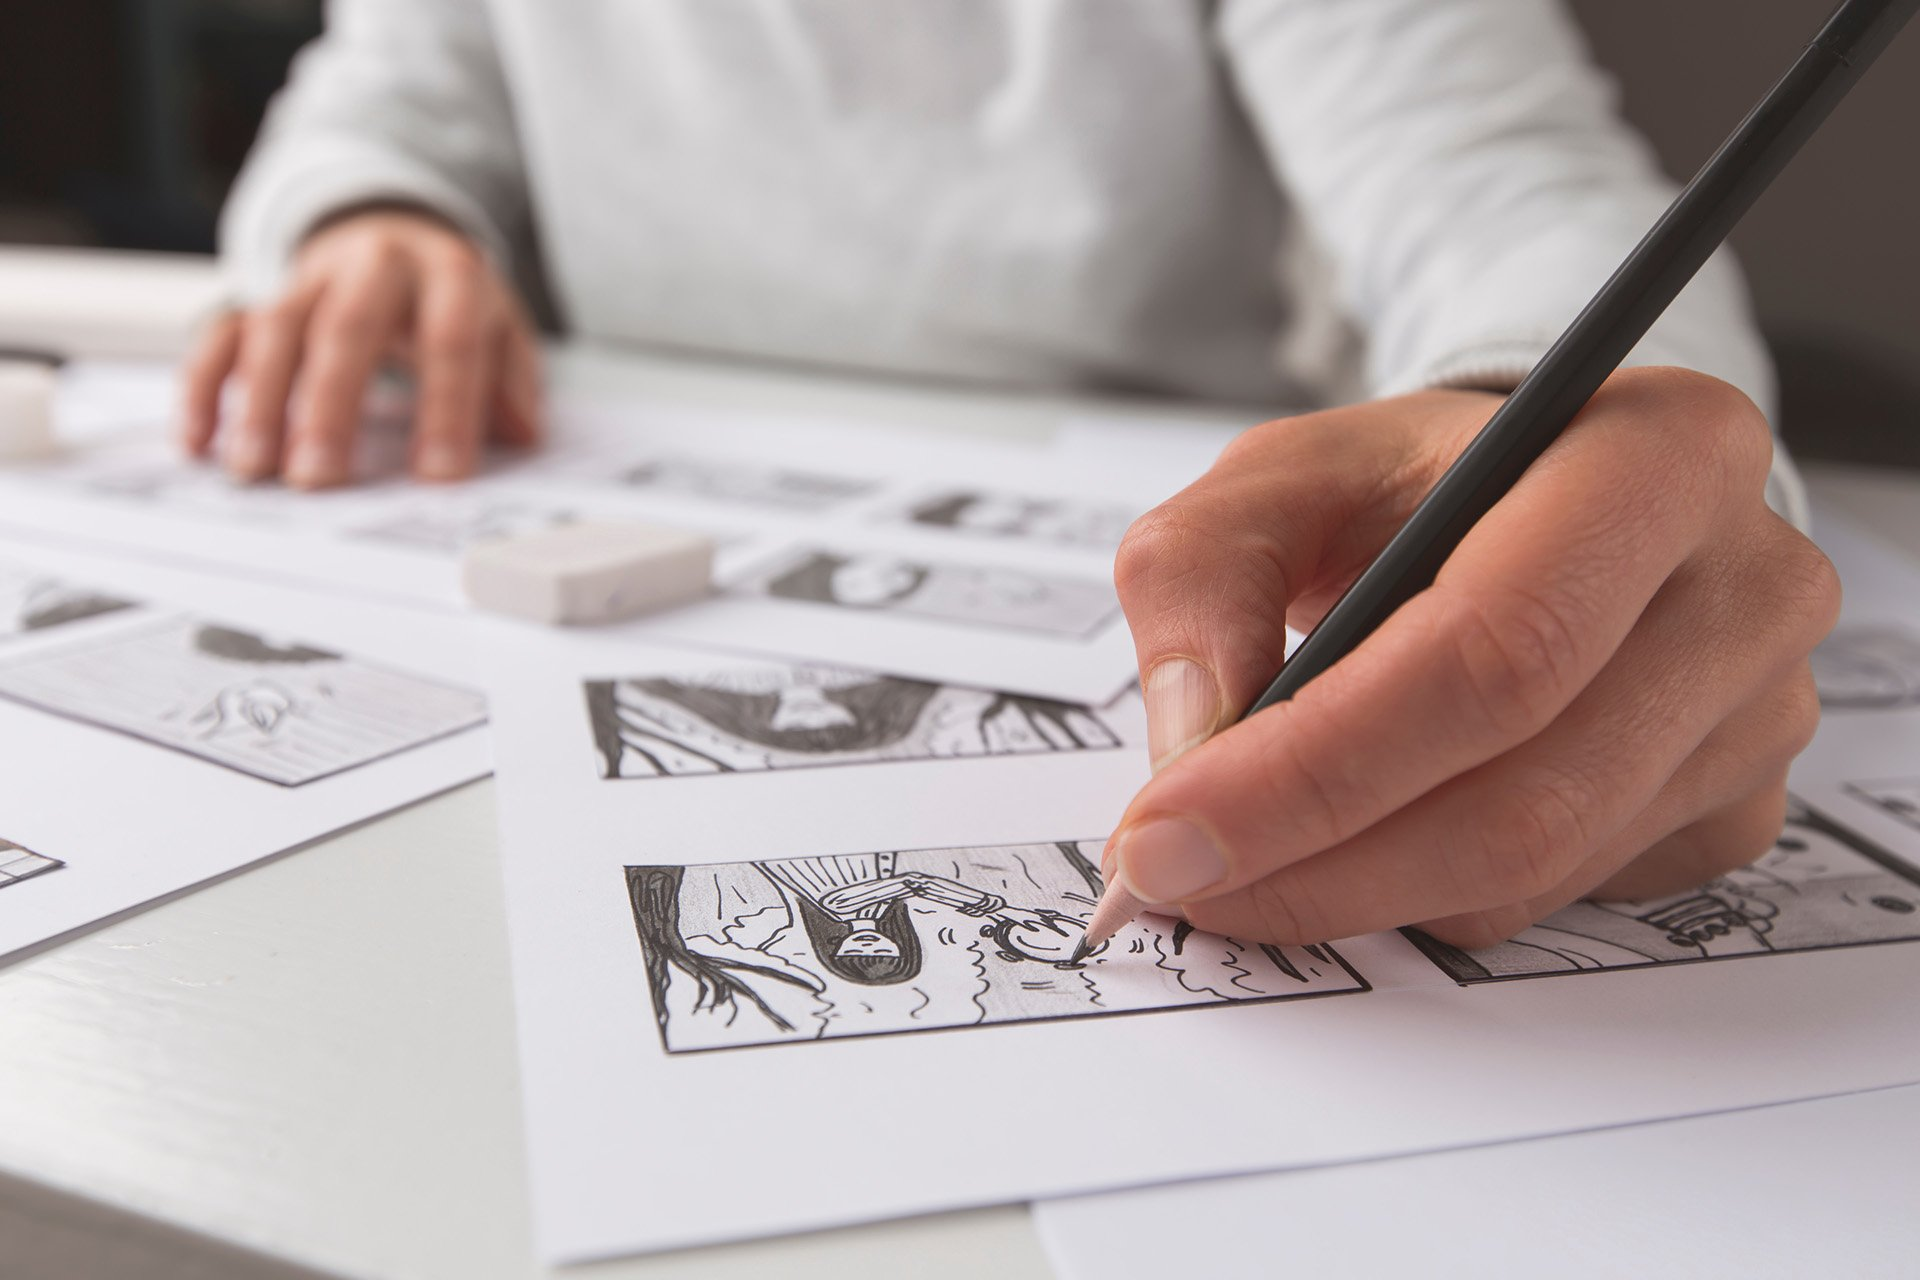 Animator storyboarding a scene